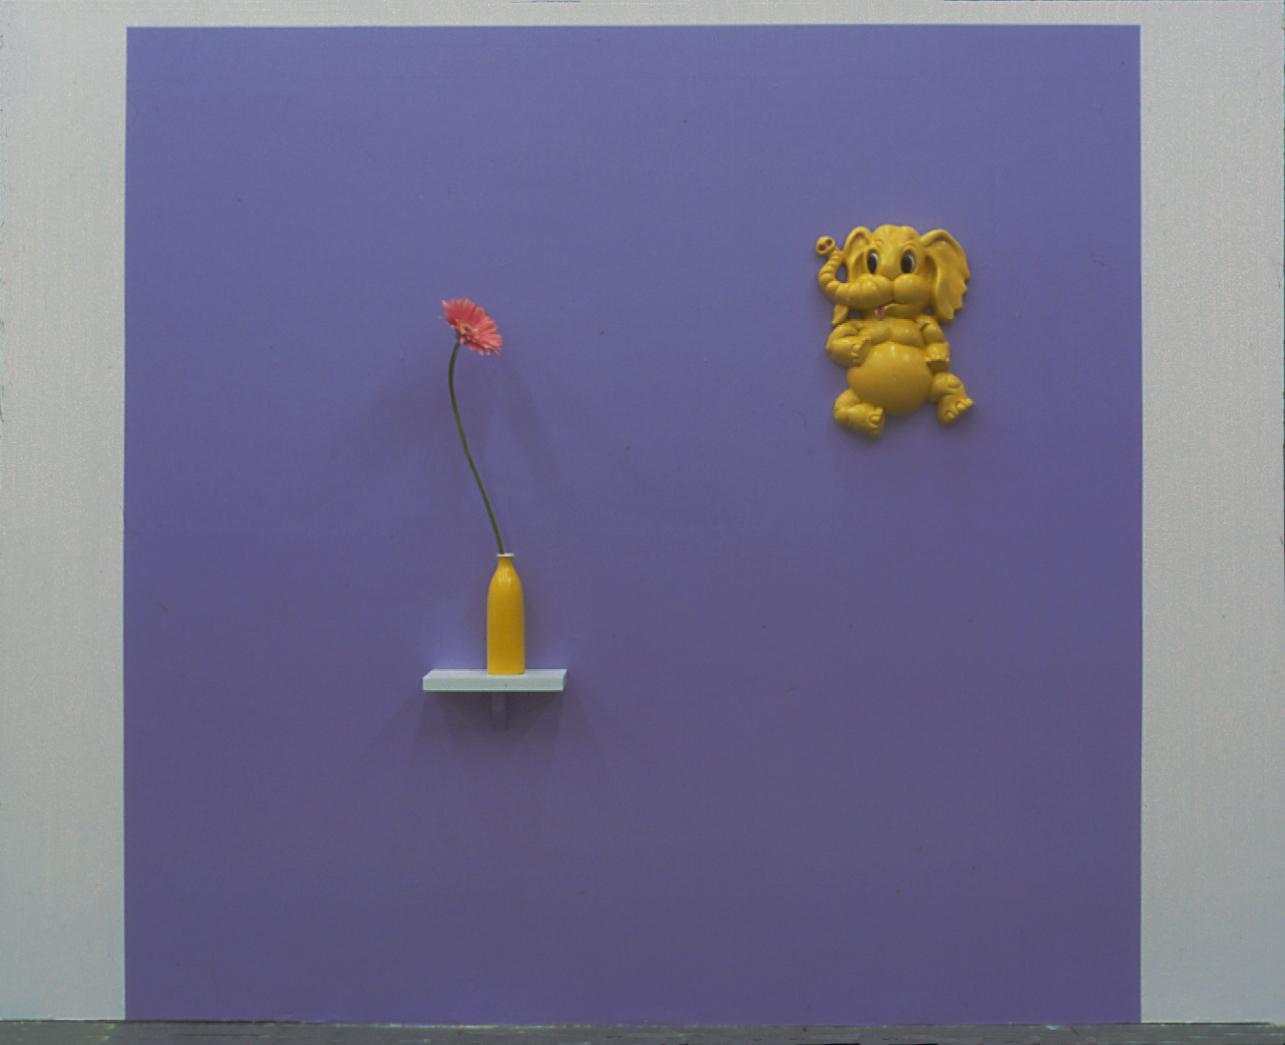 Serenade, latex paint, vase, plastic elephant, Gerbera daisy, 60 x 60 x 3 inches, 1998.